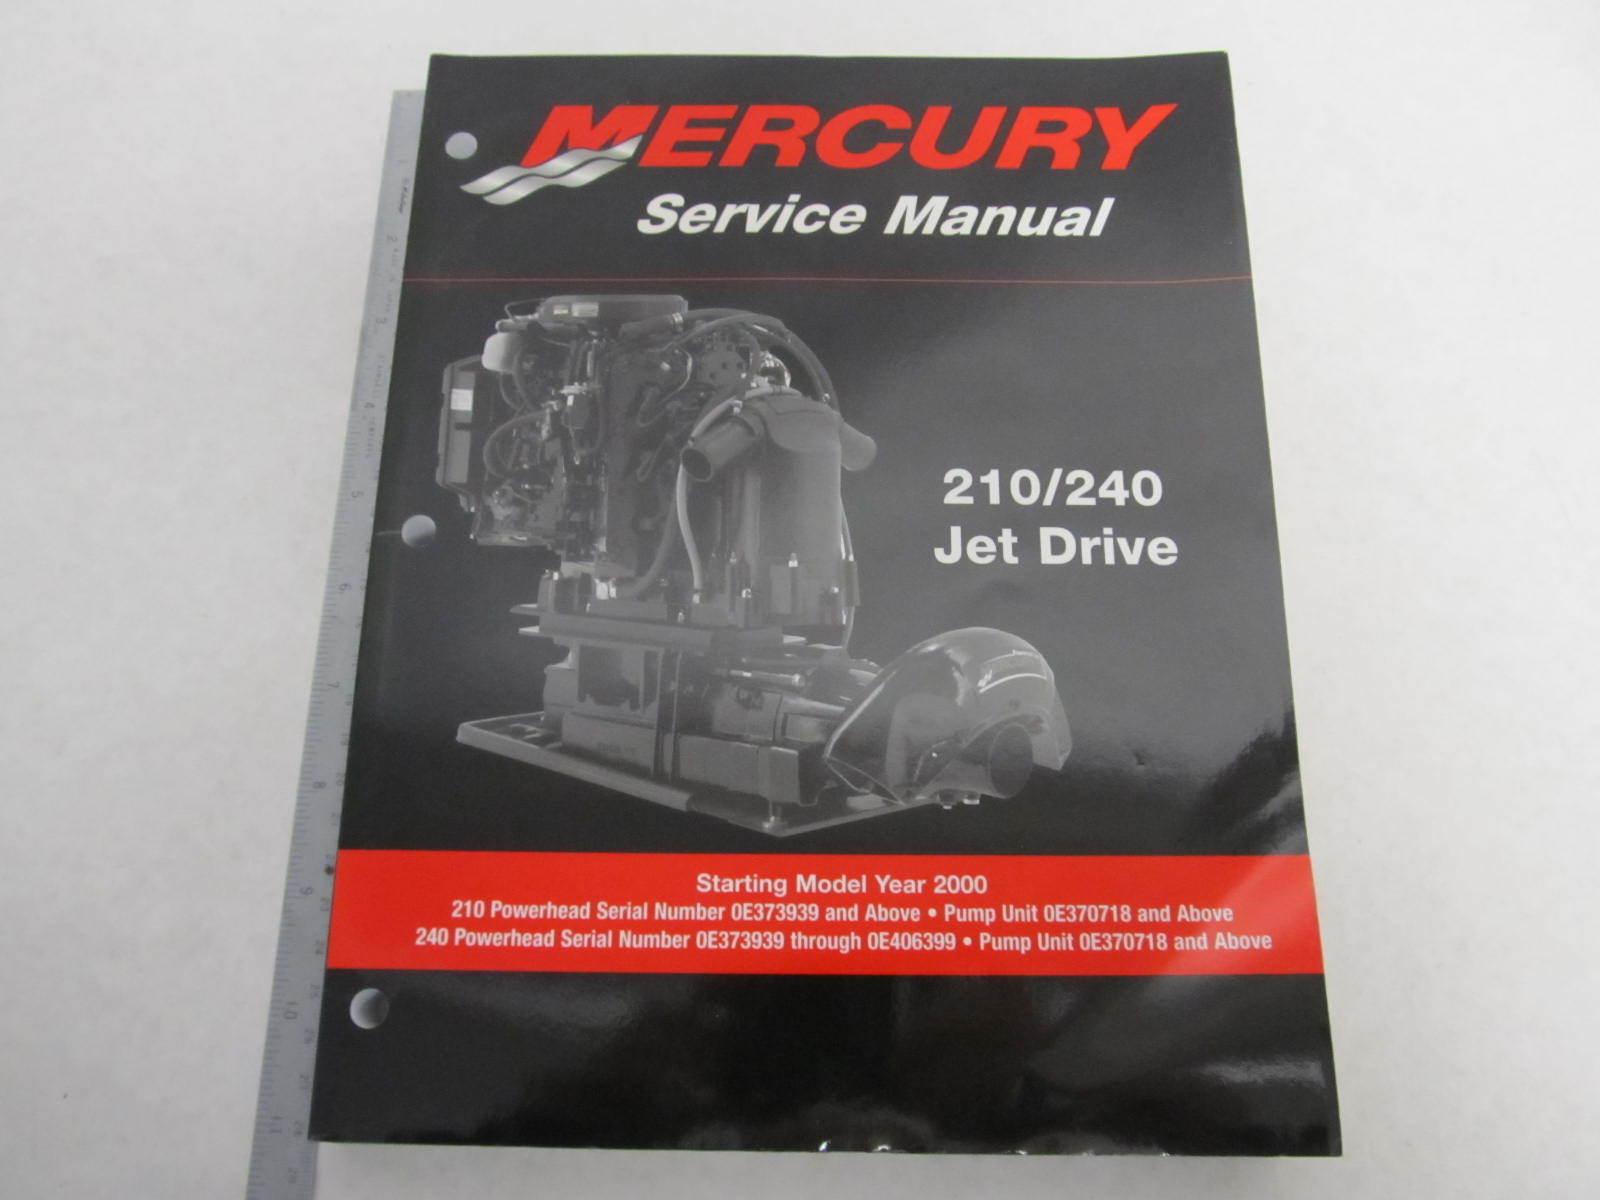 2002 mercury outboard service manual